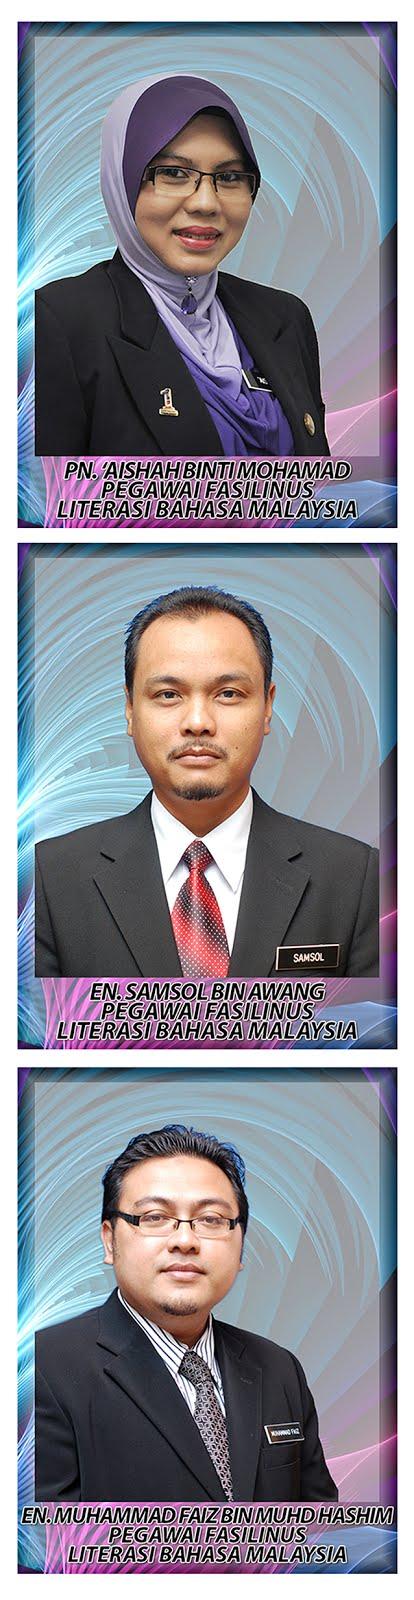 FASILINUS LITERASI BAHASA MALAYSIA